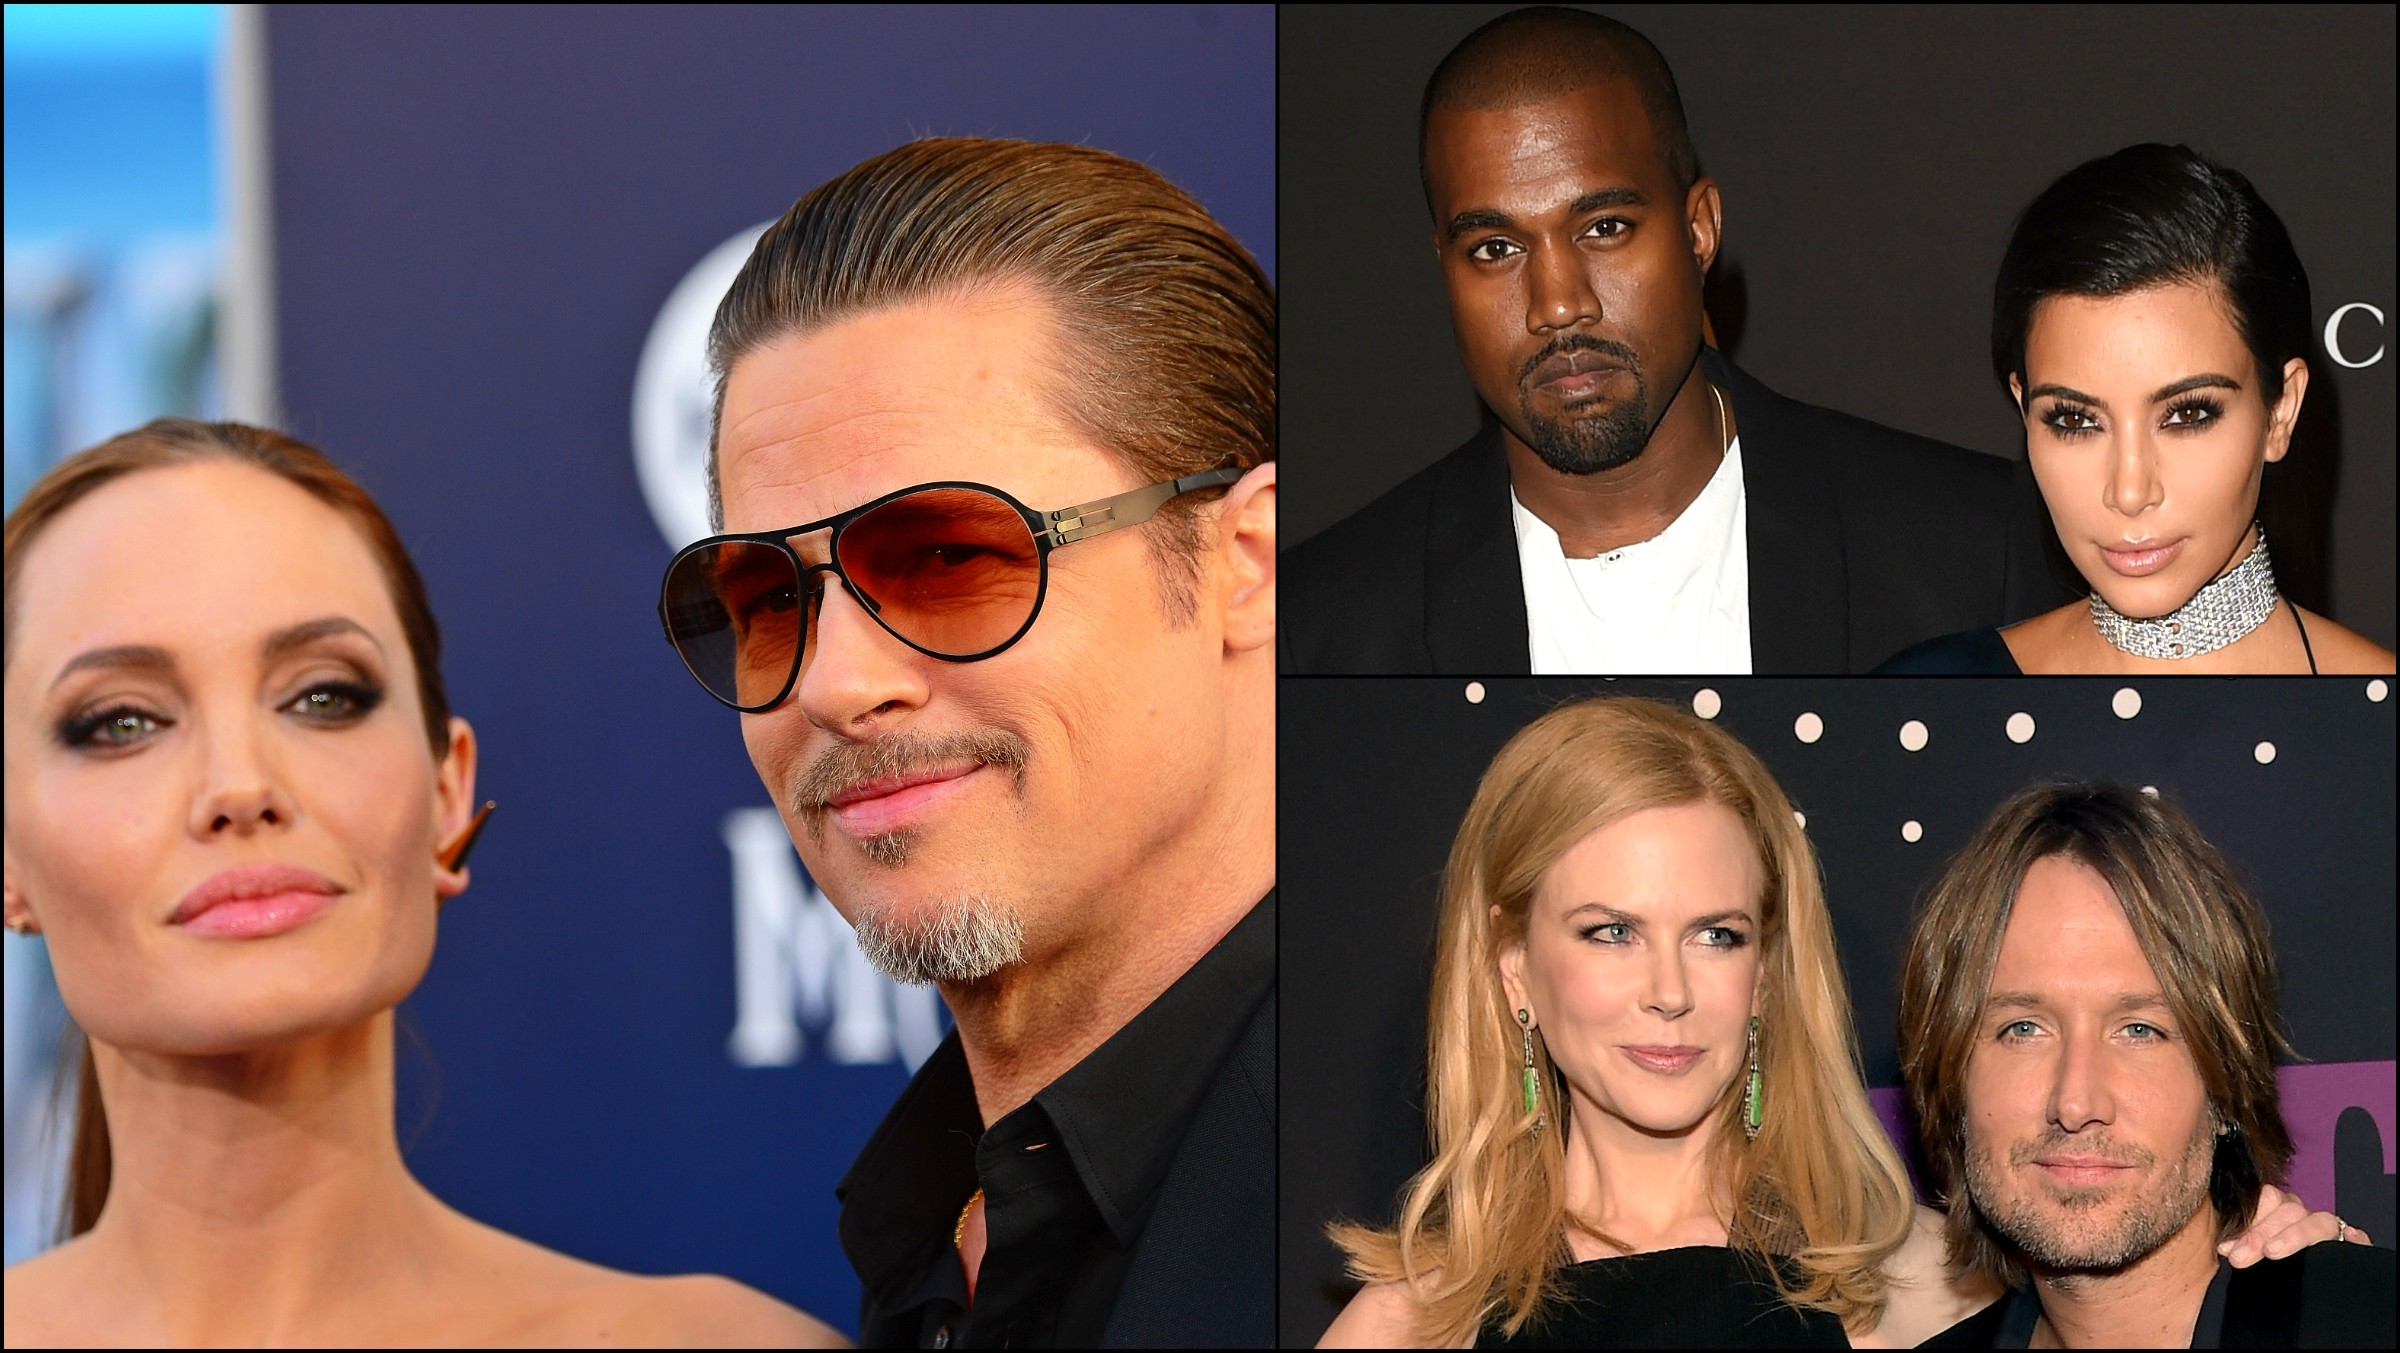 Angelina Jolie com Brad Pitt, Kim Kardashian com Kanye West e Nicole Kidman com Keith Urban. (Foto: Getty Images)